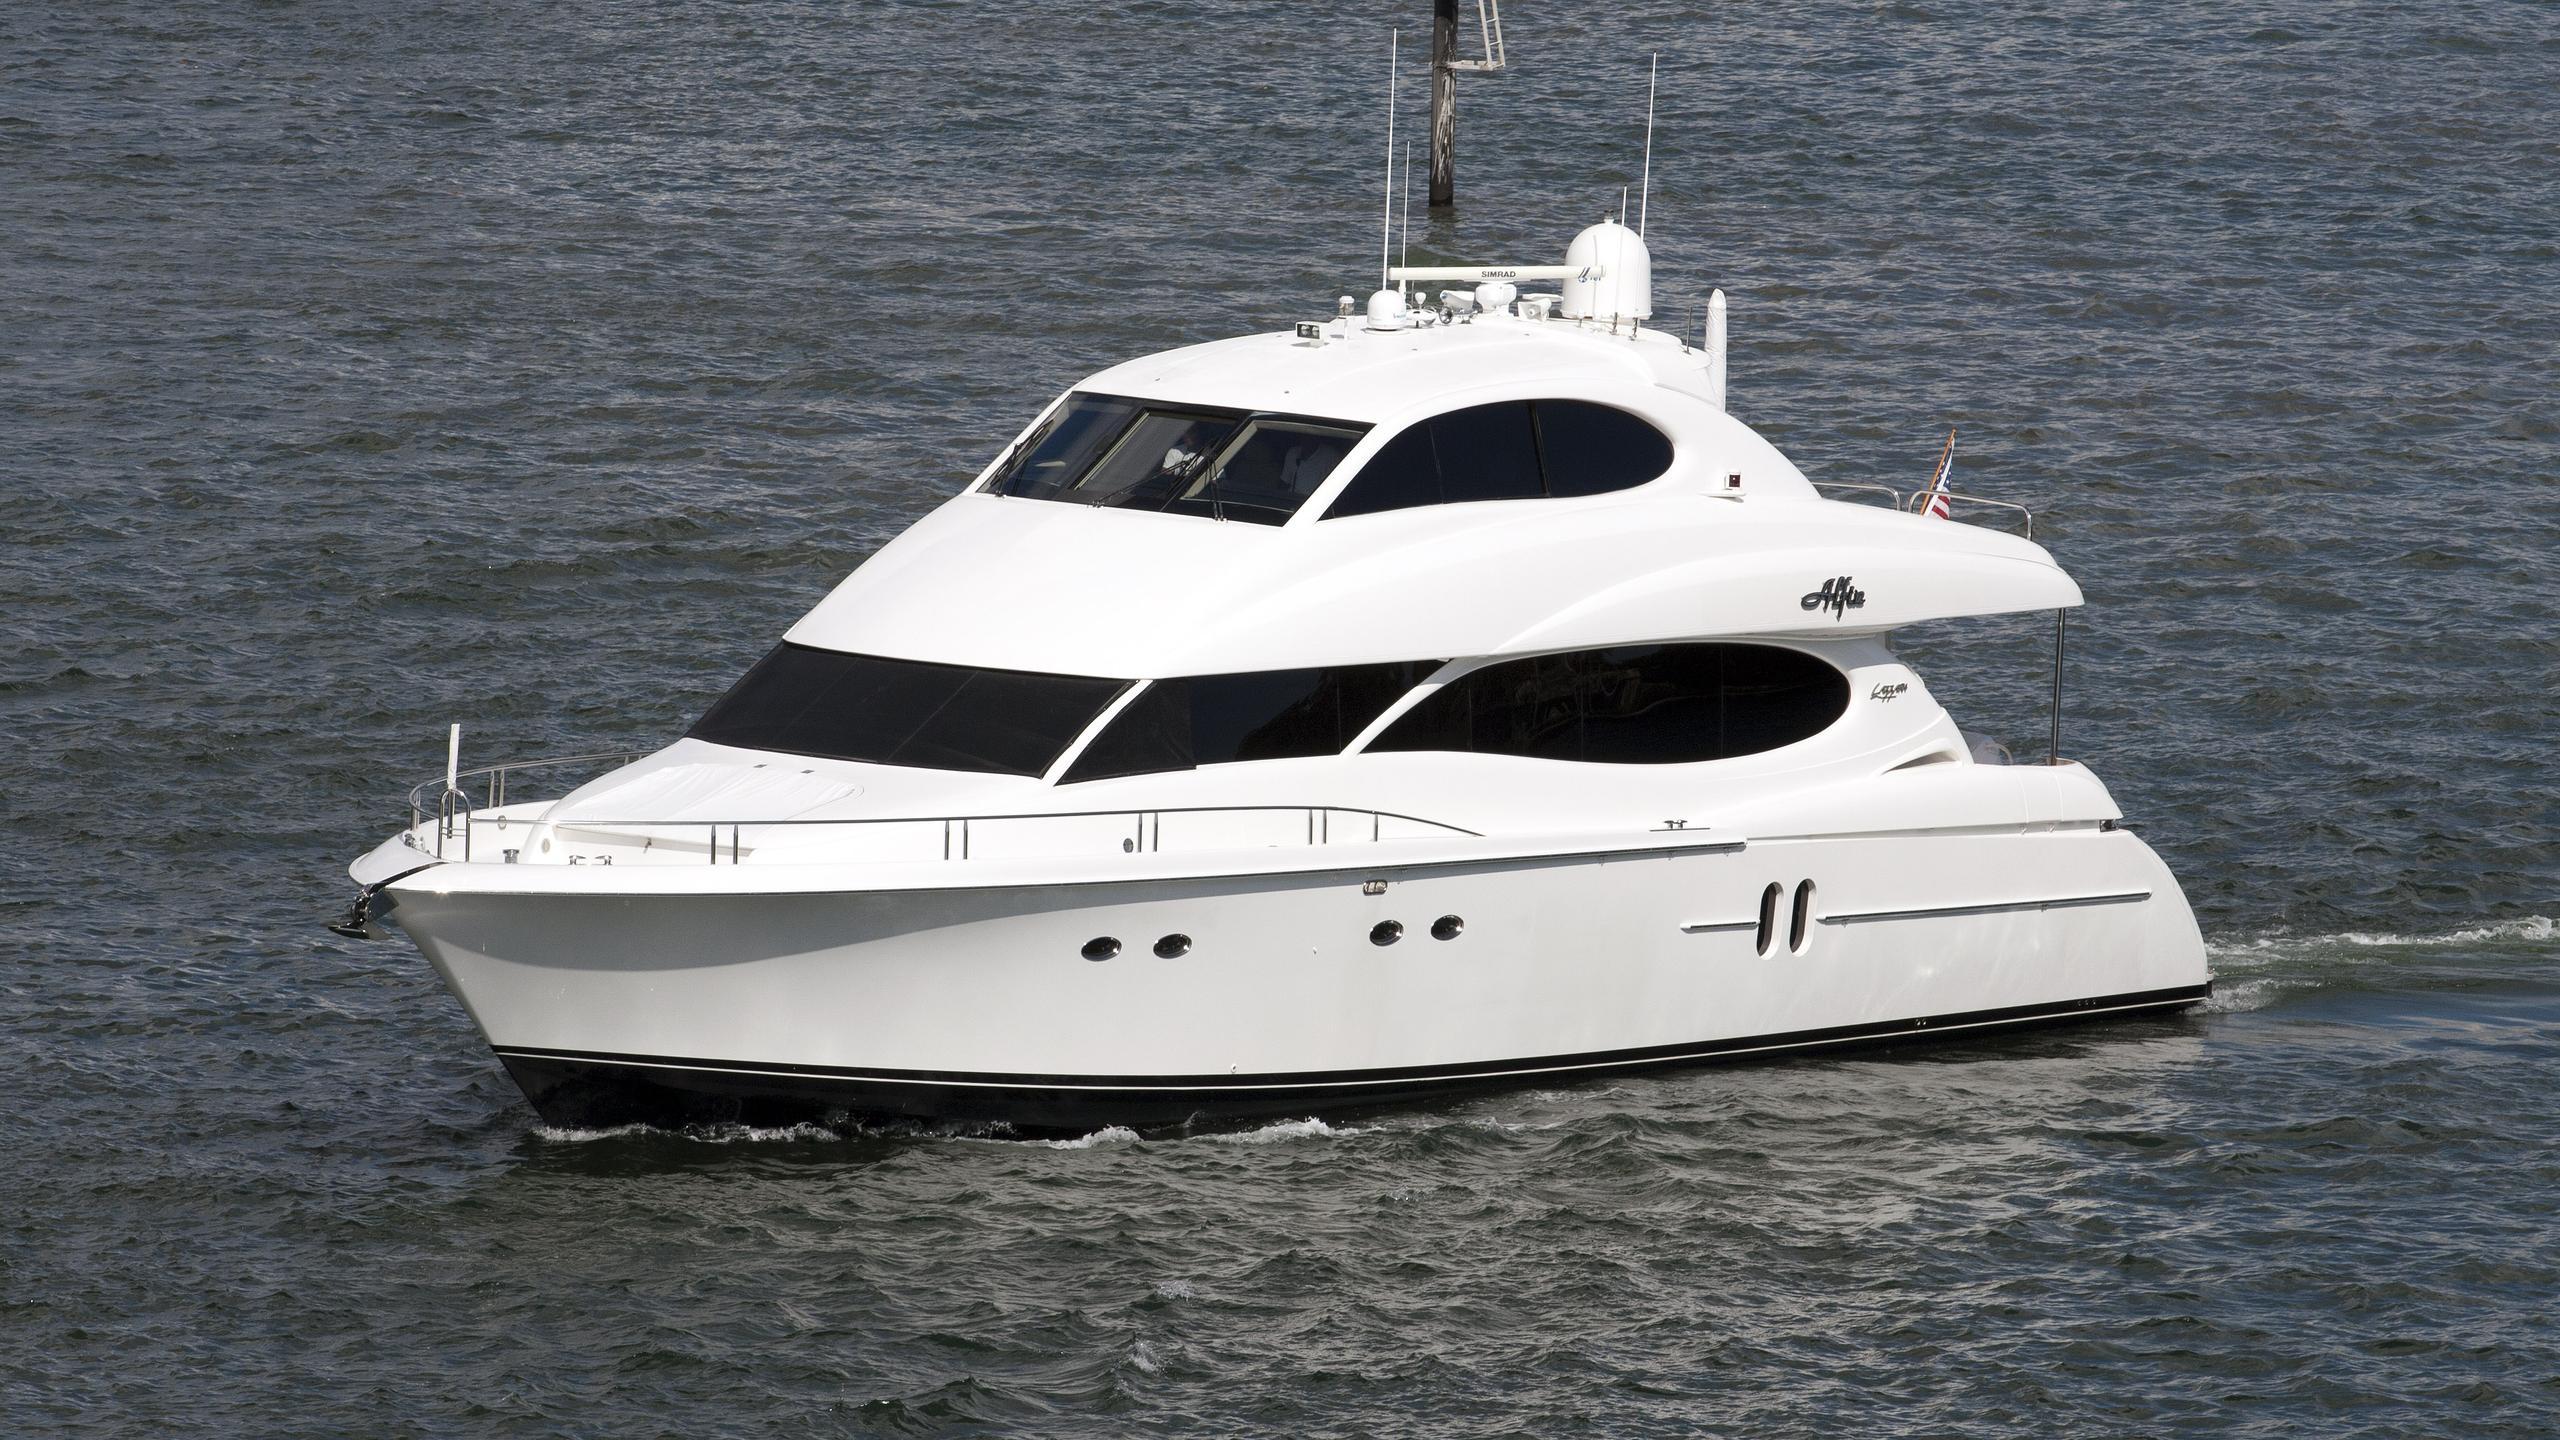 shar-o-kay-motor-yacht-lazzara-80-si-2003-25m-cruising